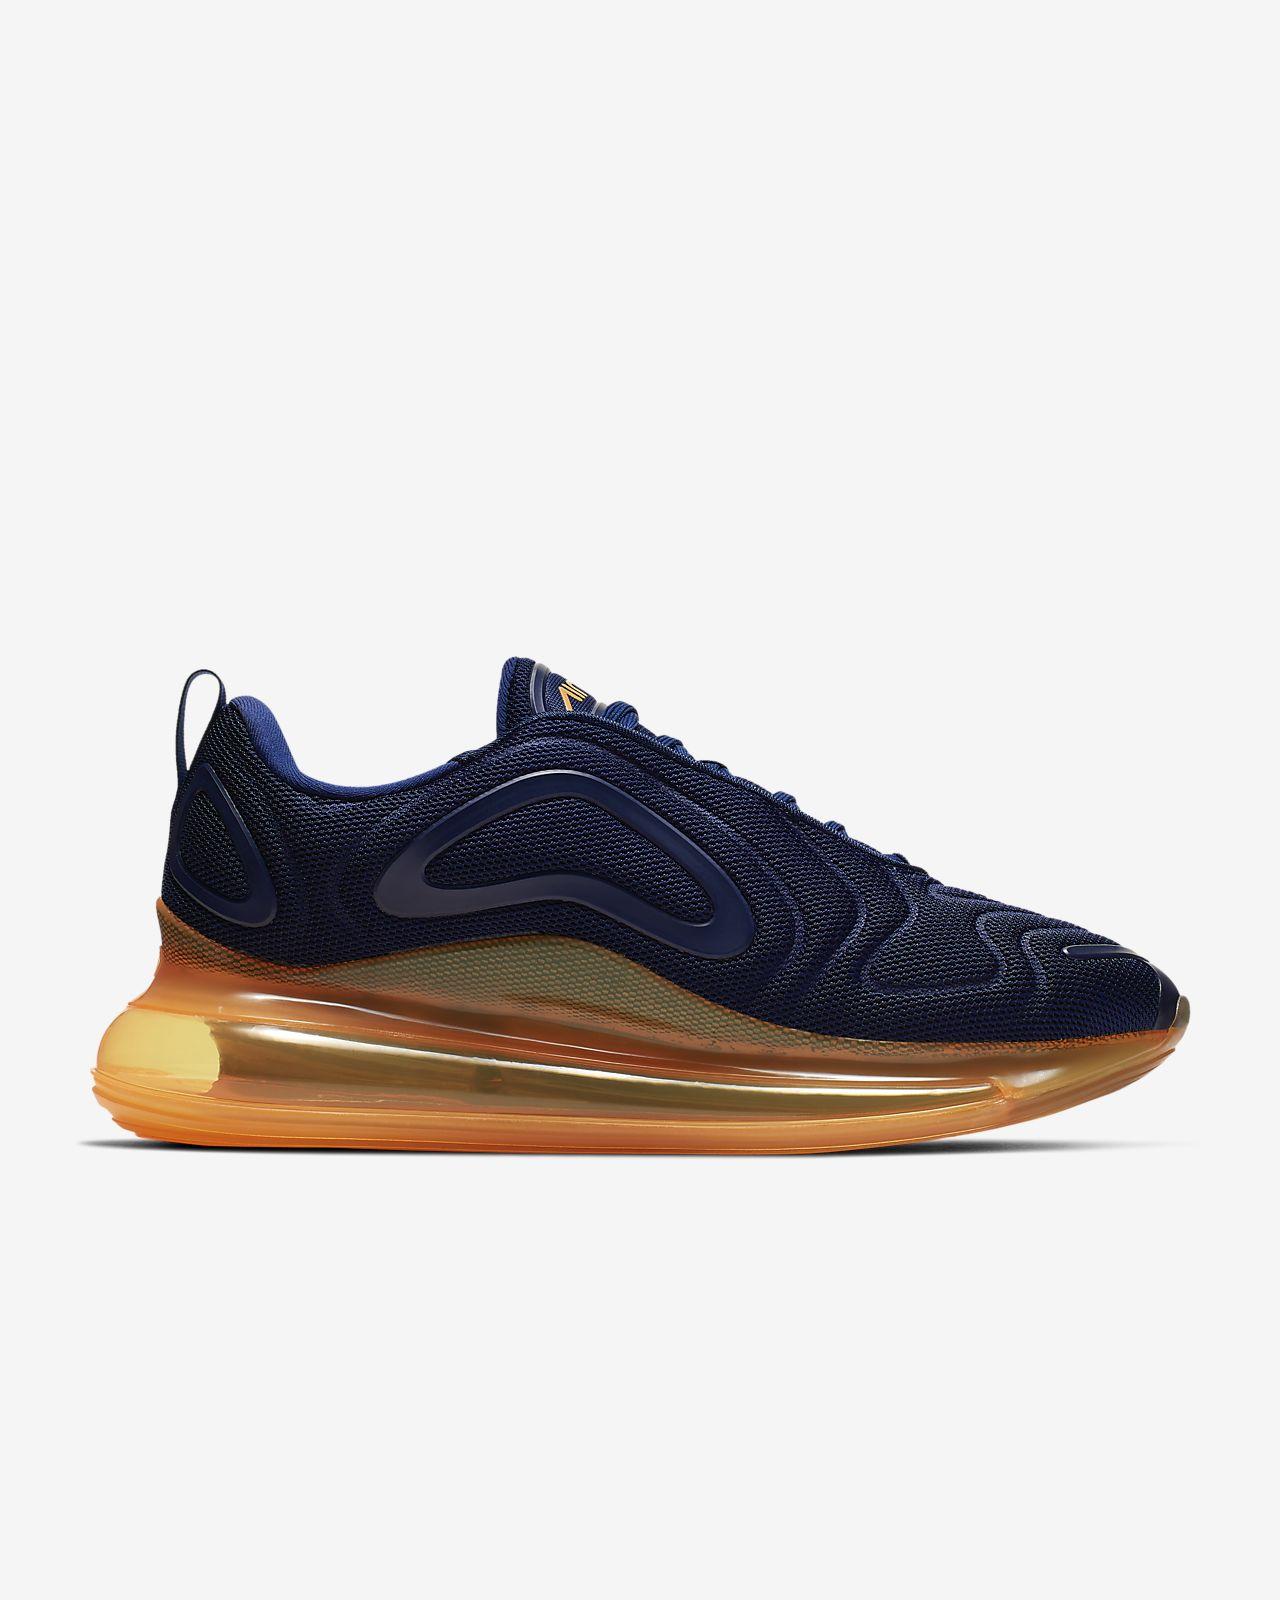 best loved 07ed0 22258 ... Nike Air Max 720 Men s Shoe